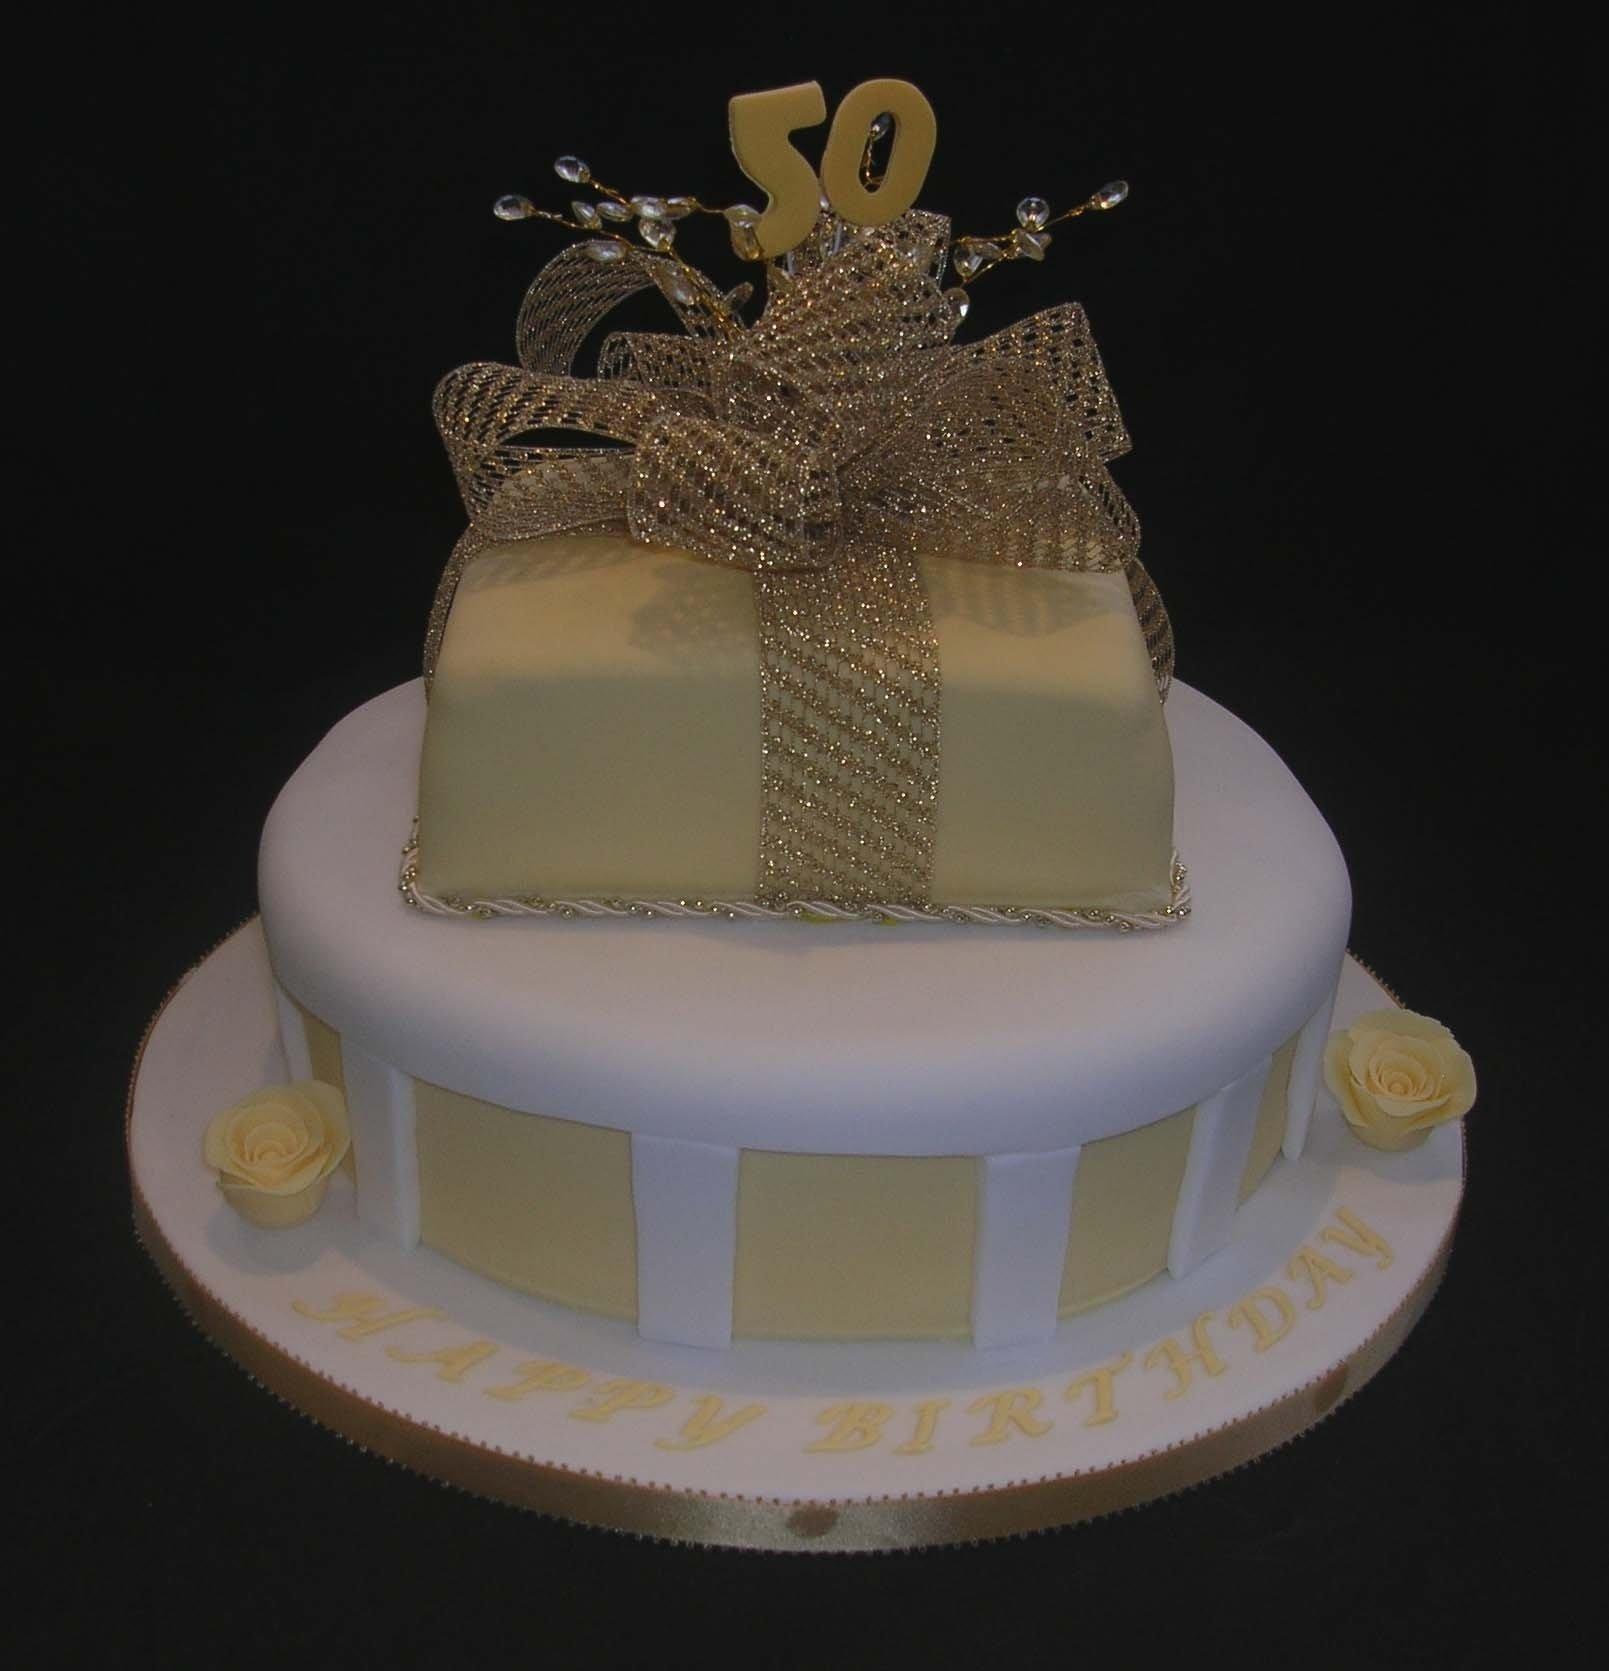 10 Wonderful Ideas For 50Th Birthday Cake 50th birthday cake decorating ideas walah walah 1 2020